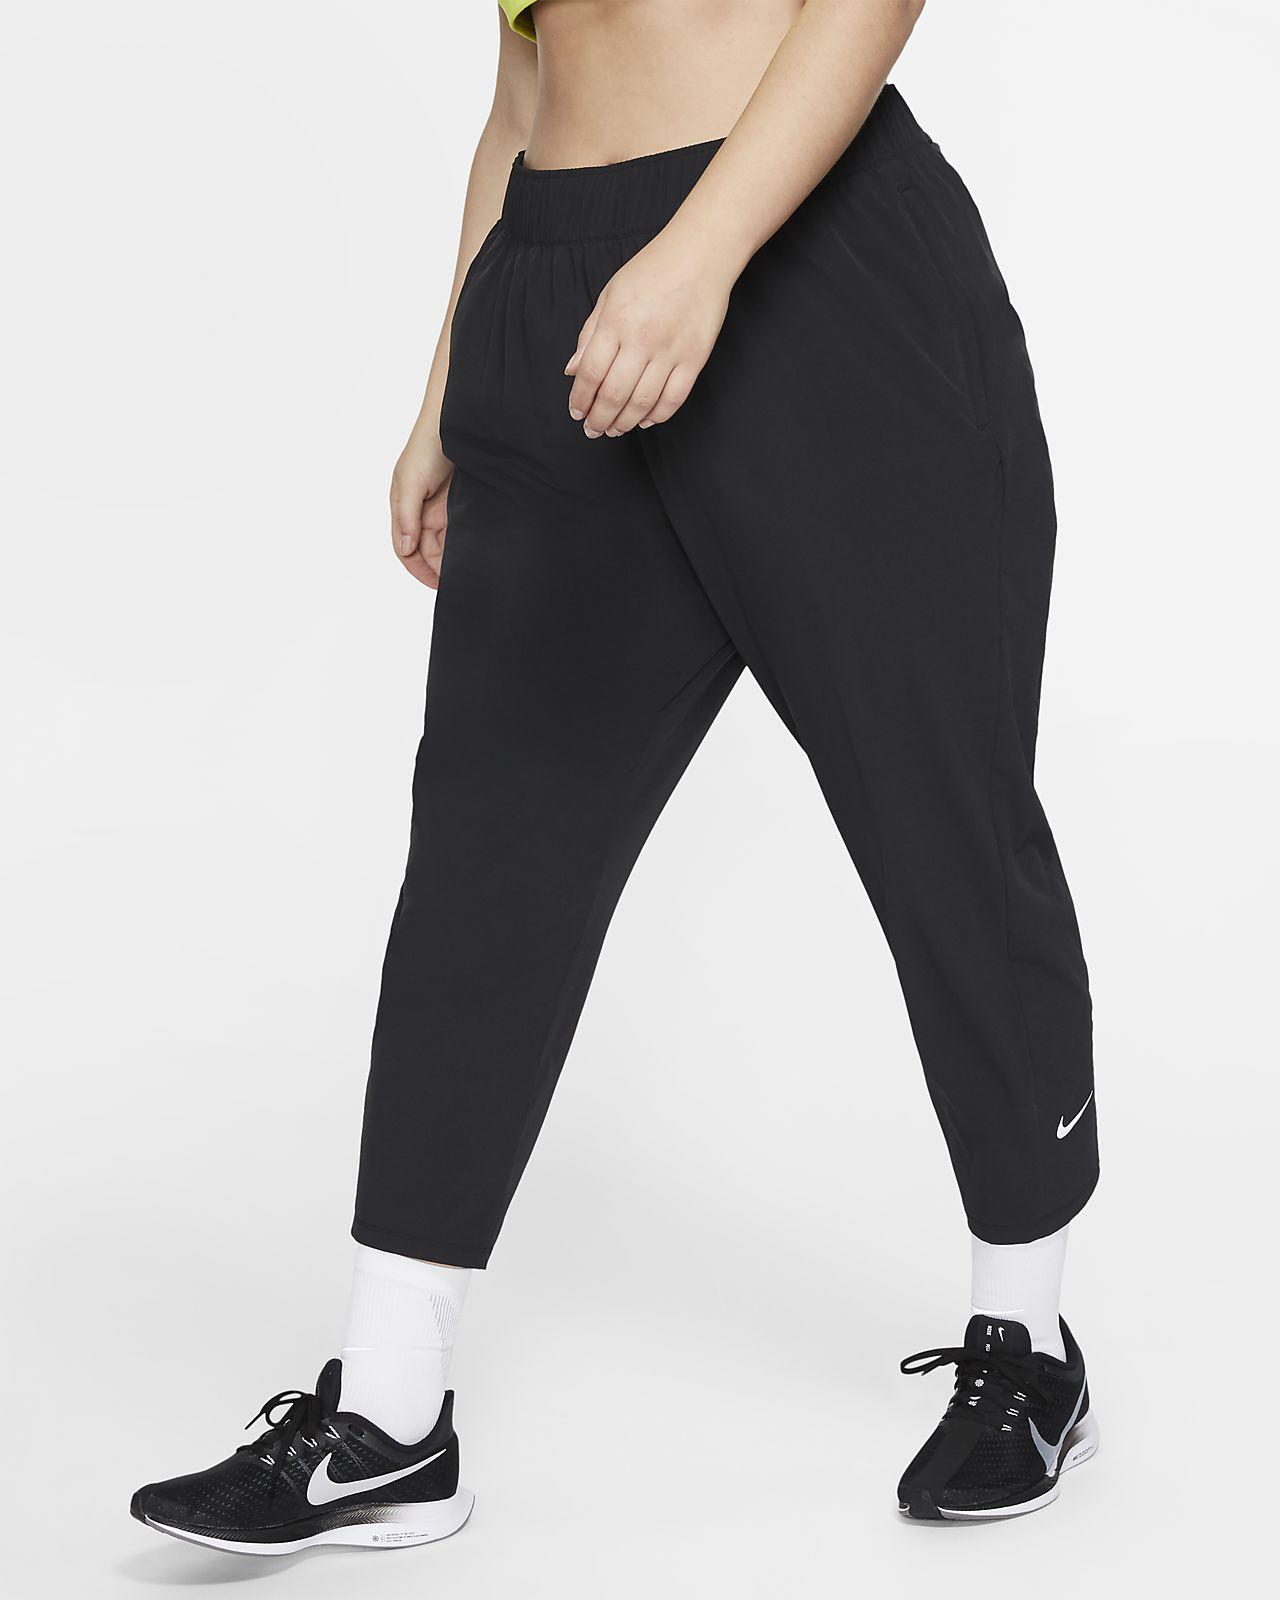 Nike Essential Pantalón de running de 7/8 (Talla grande) - Mujer